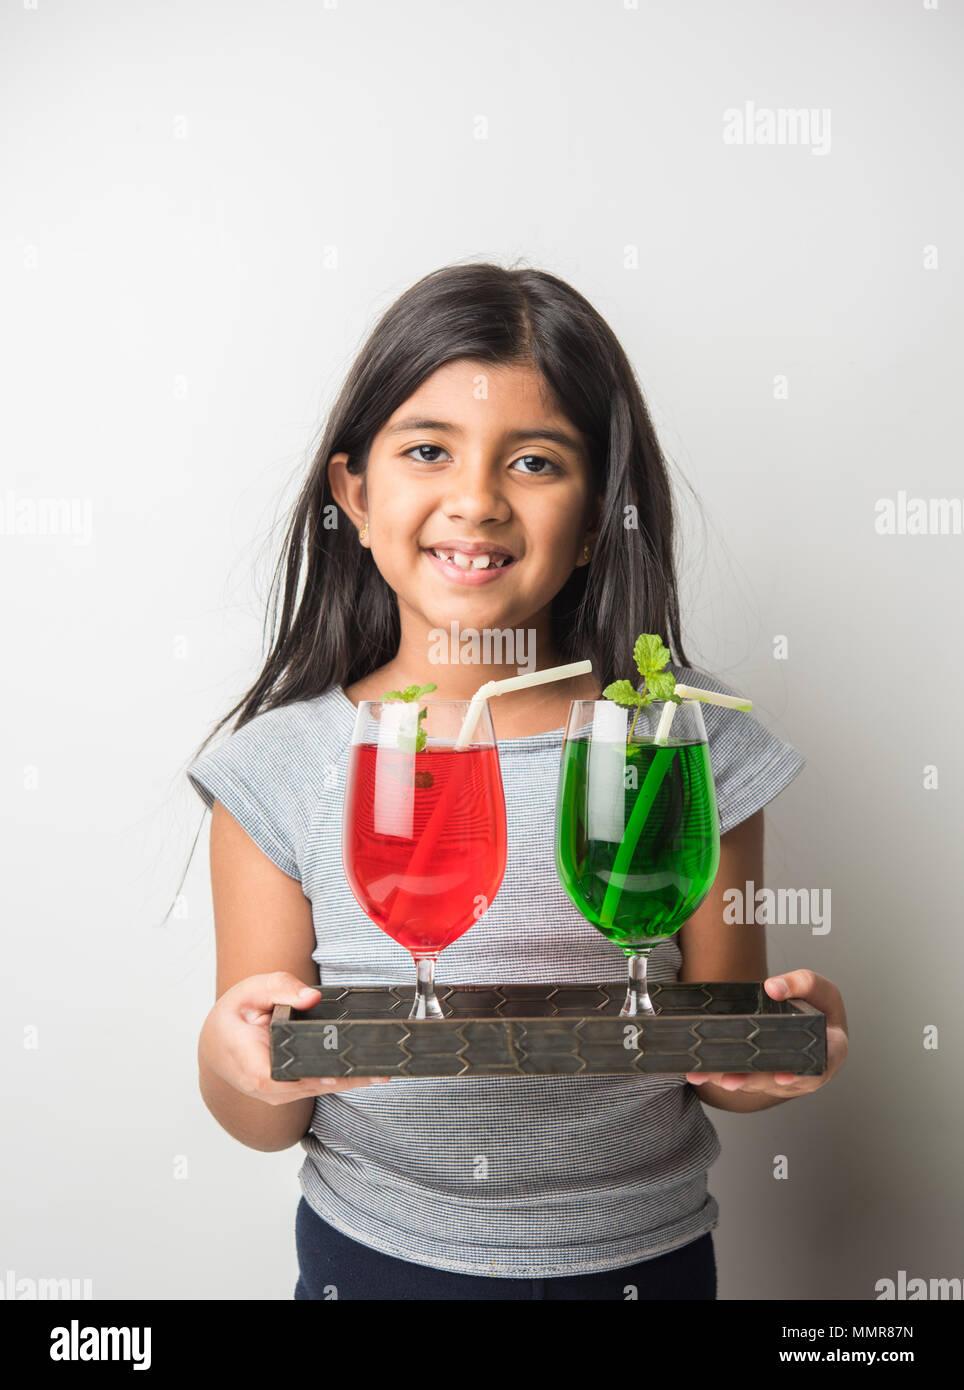 Kid Apple Indian Stock Photos Kid Apple Indian Stock billeder - Alamy-7959